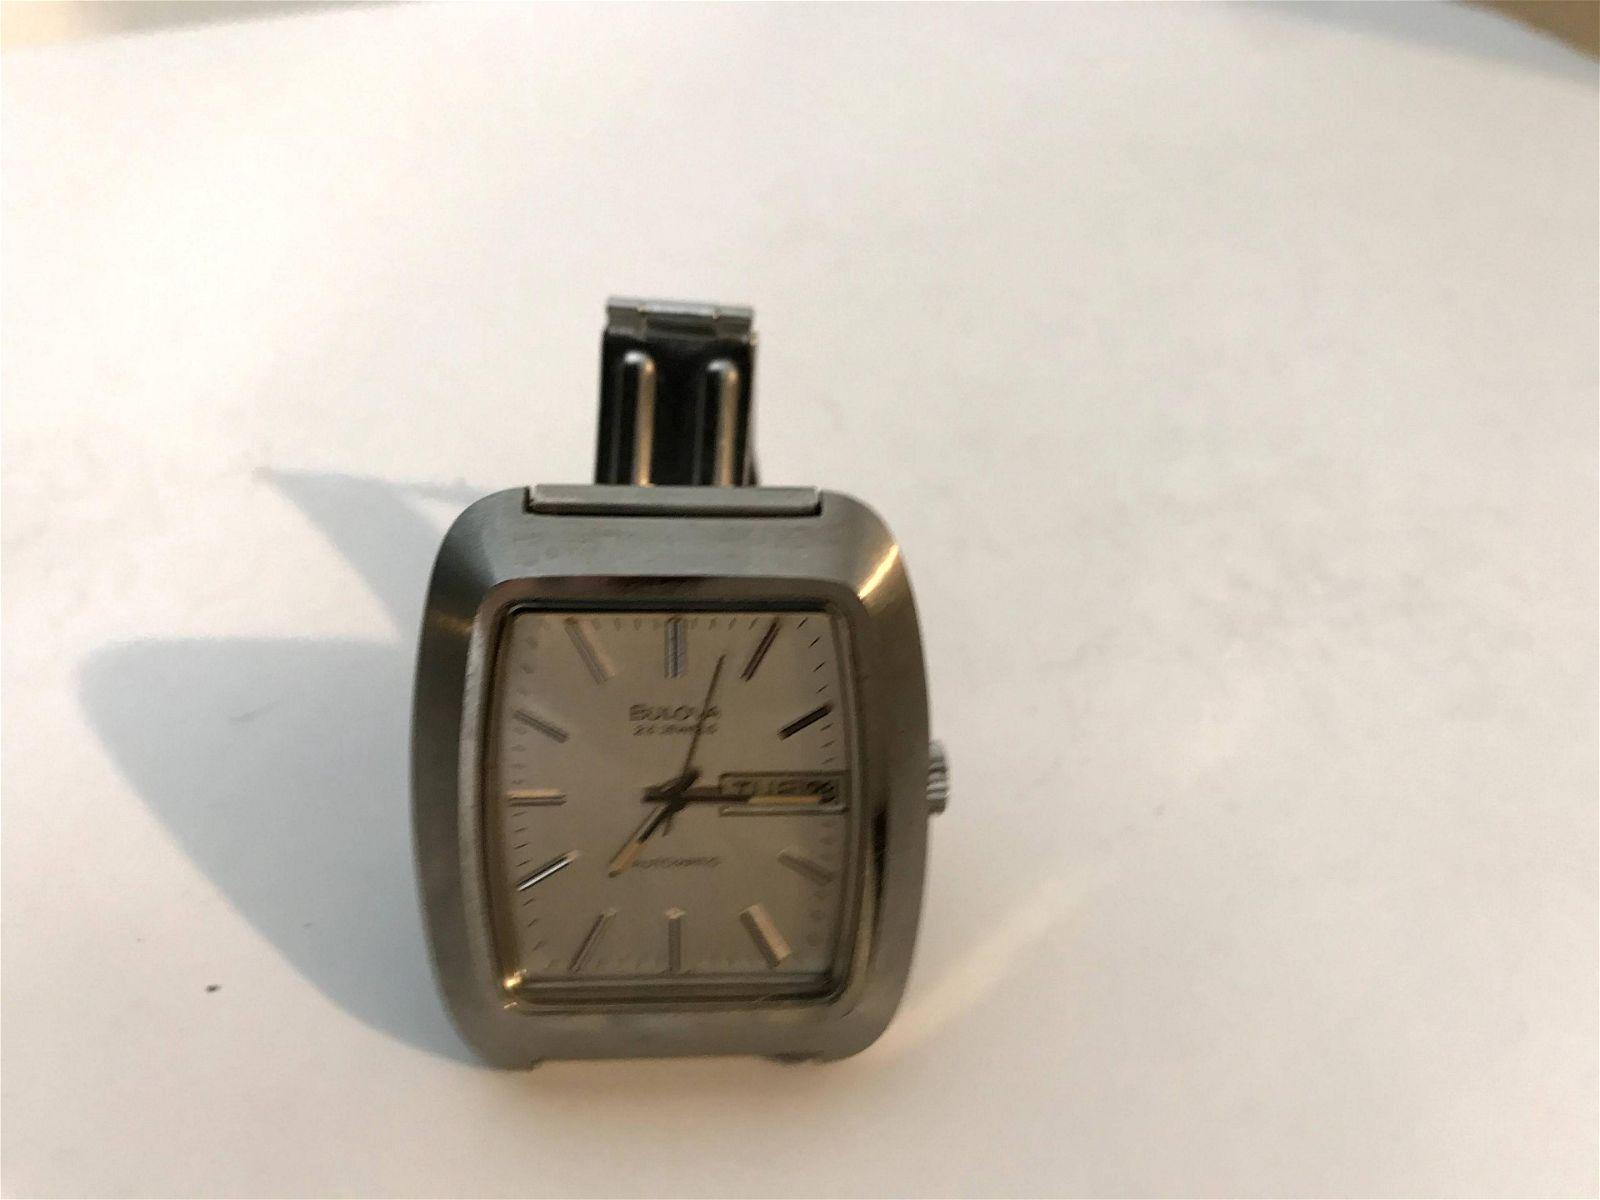 Vintage Bulova Men's Watch 21 Jewels Runs Great